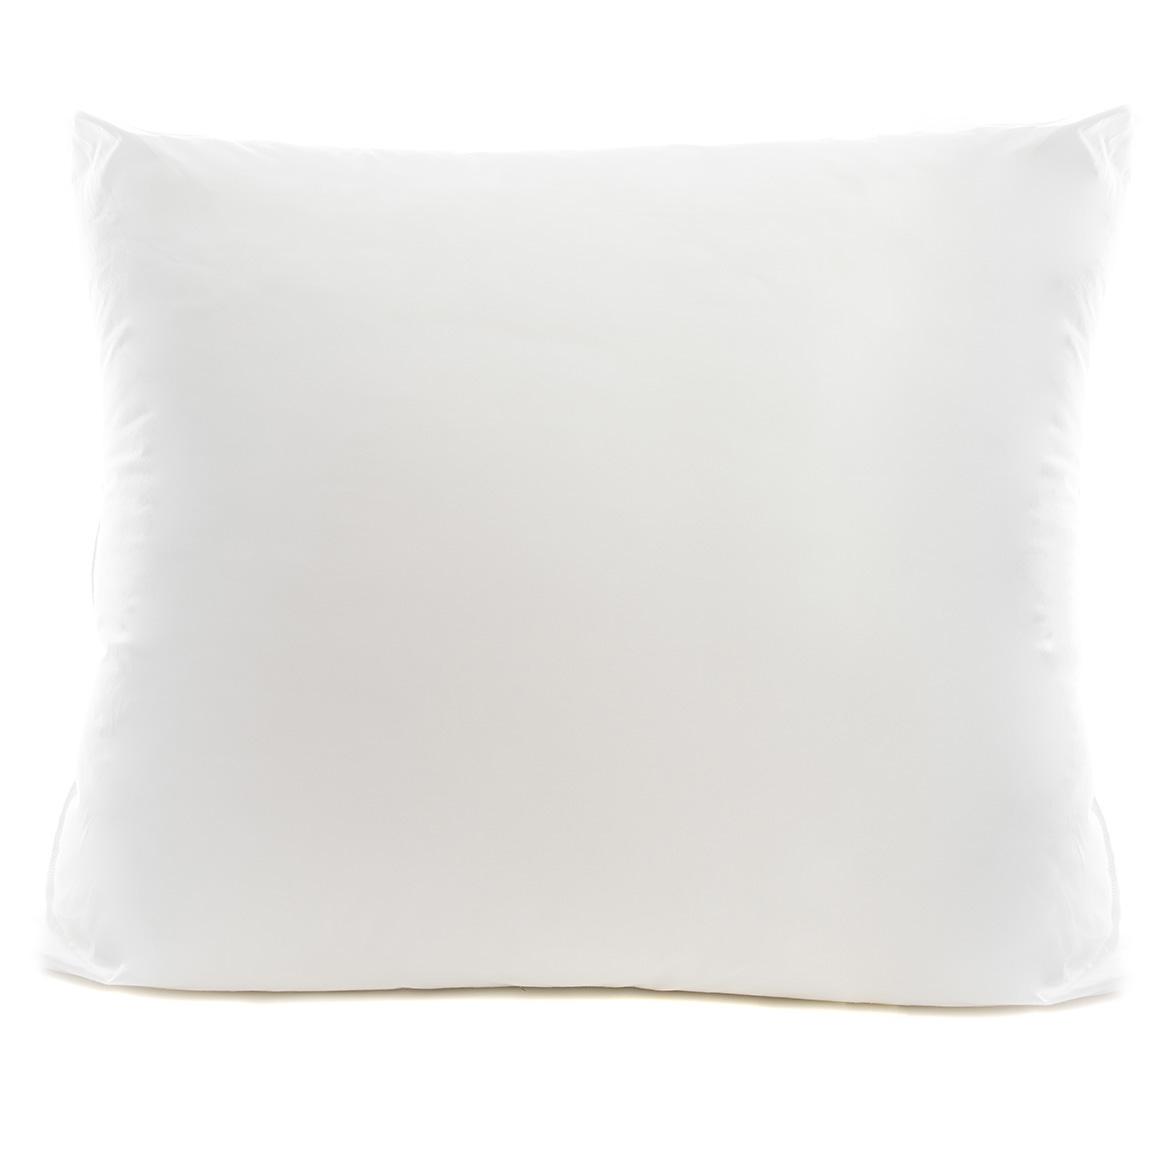 Bambi Sensitiva Pillow - Standard - Euro - King Sizes